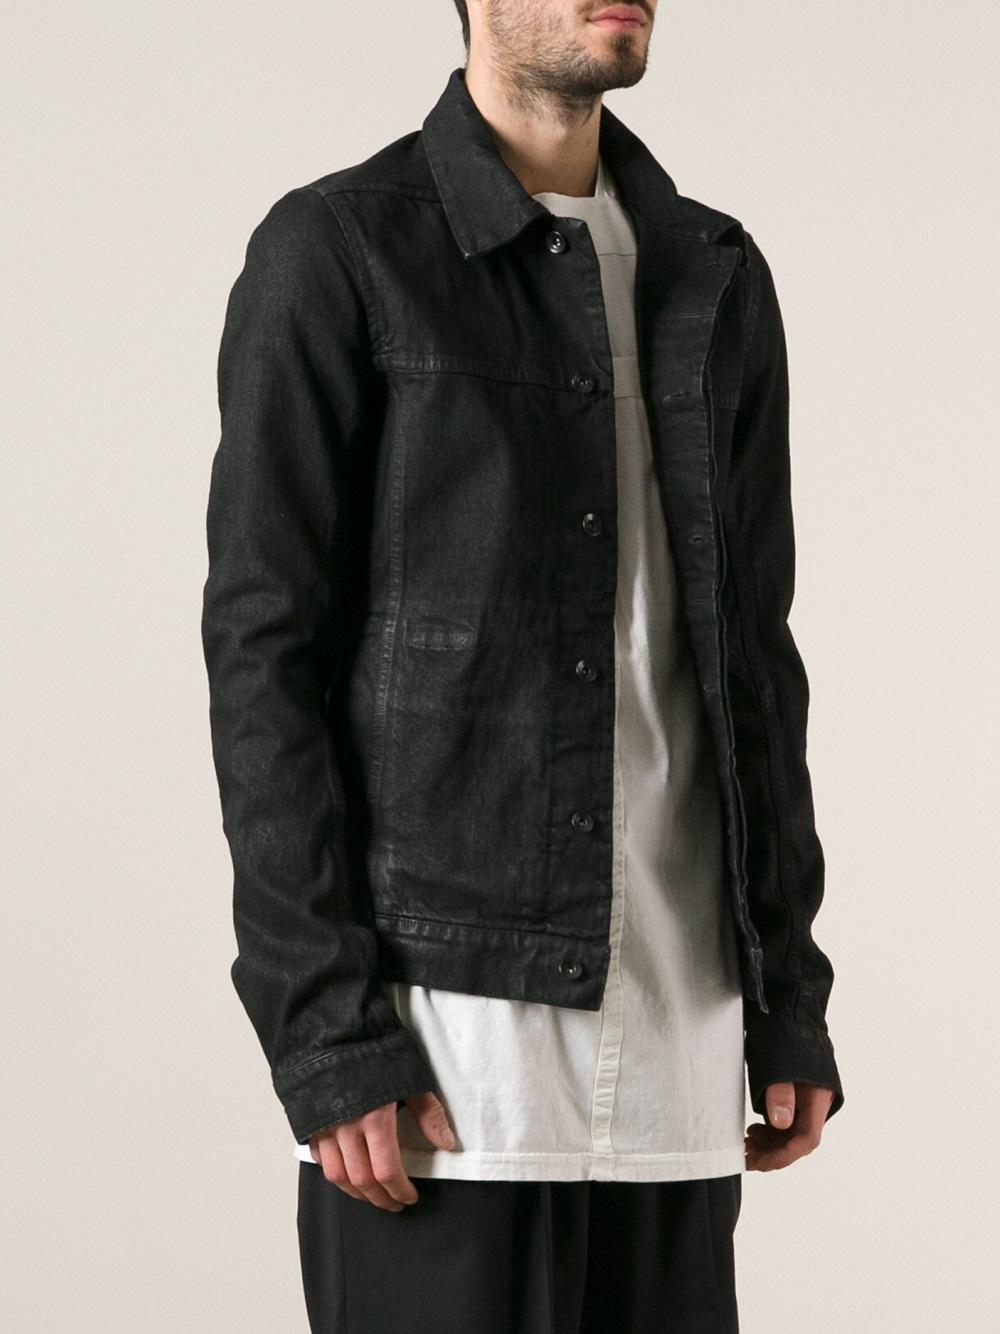 lyst rick owens drkshdw denim worker jacket in black for men